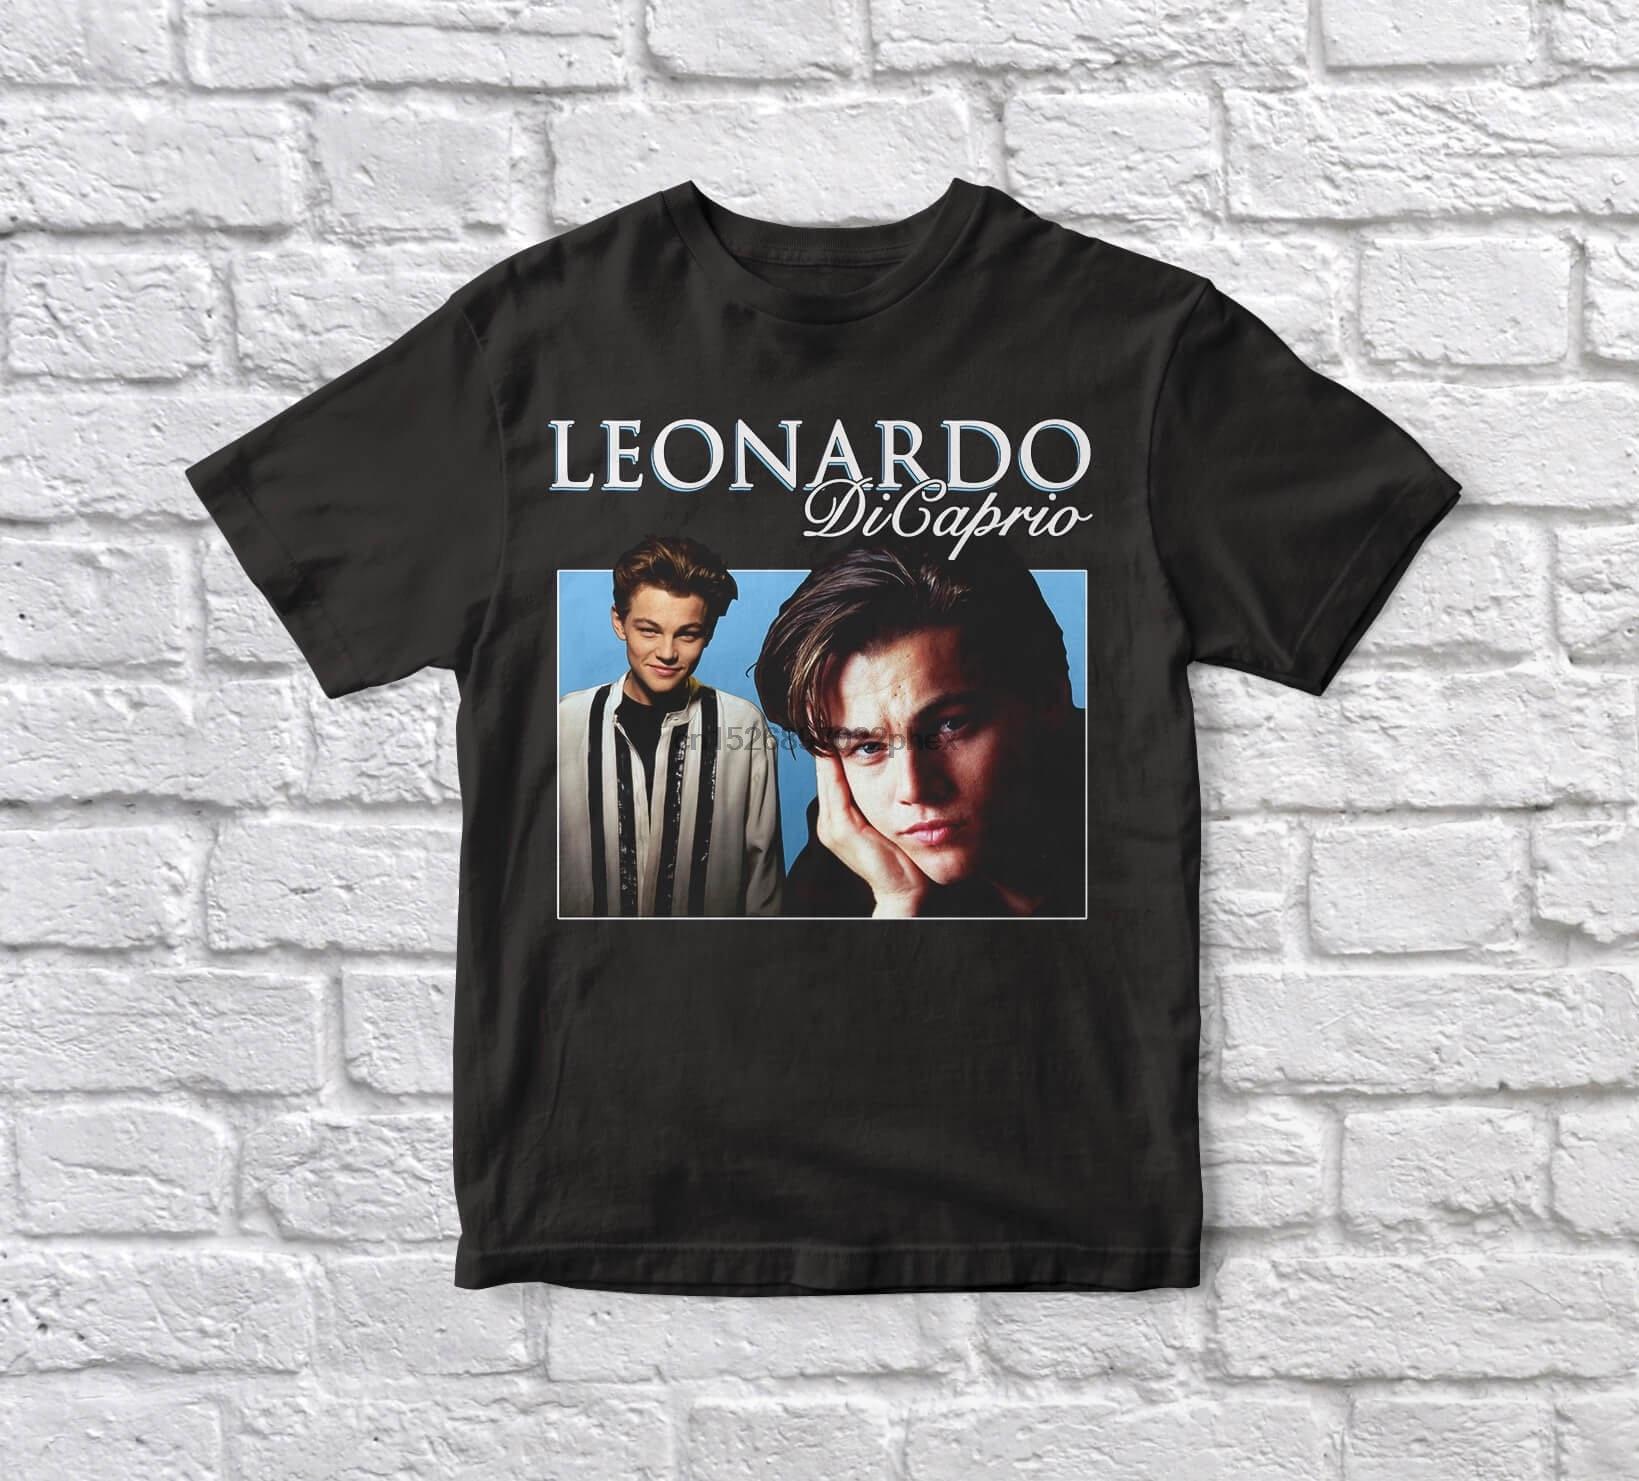 Leonardo dicaprio titanic 90s vintage unisex preto camiseta masculina